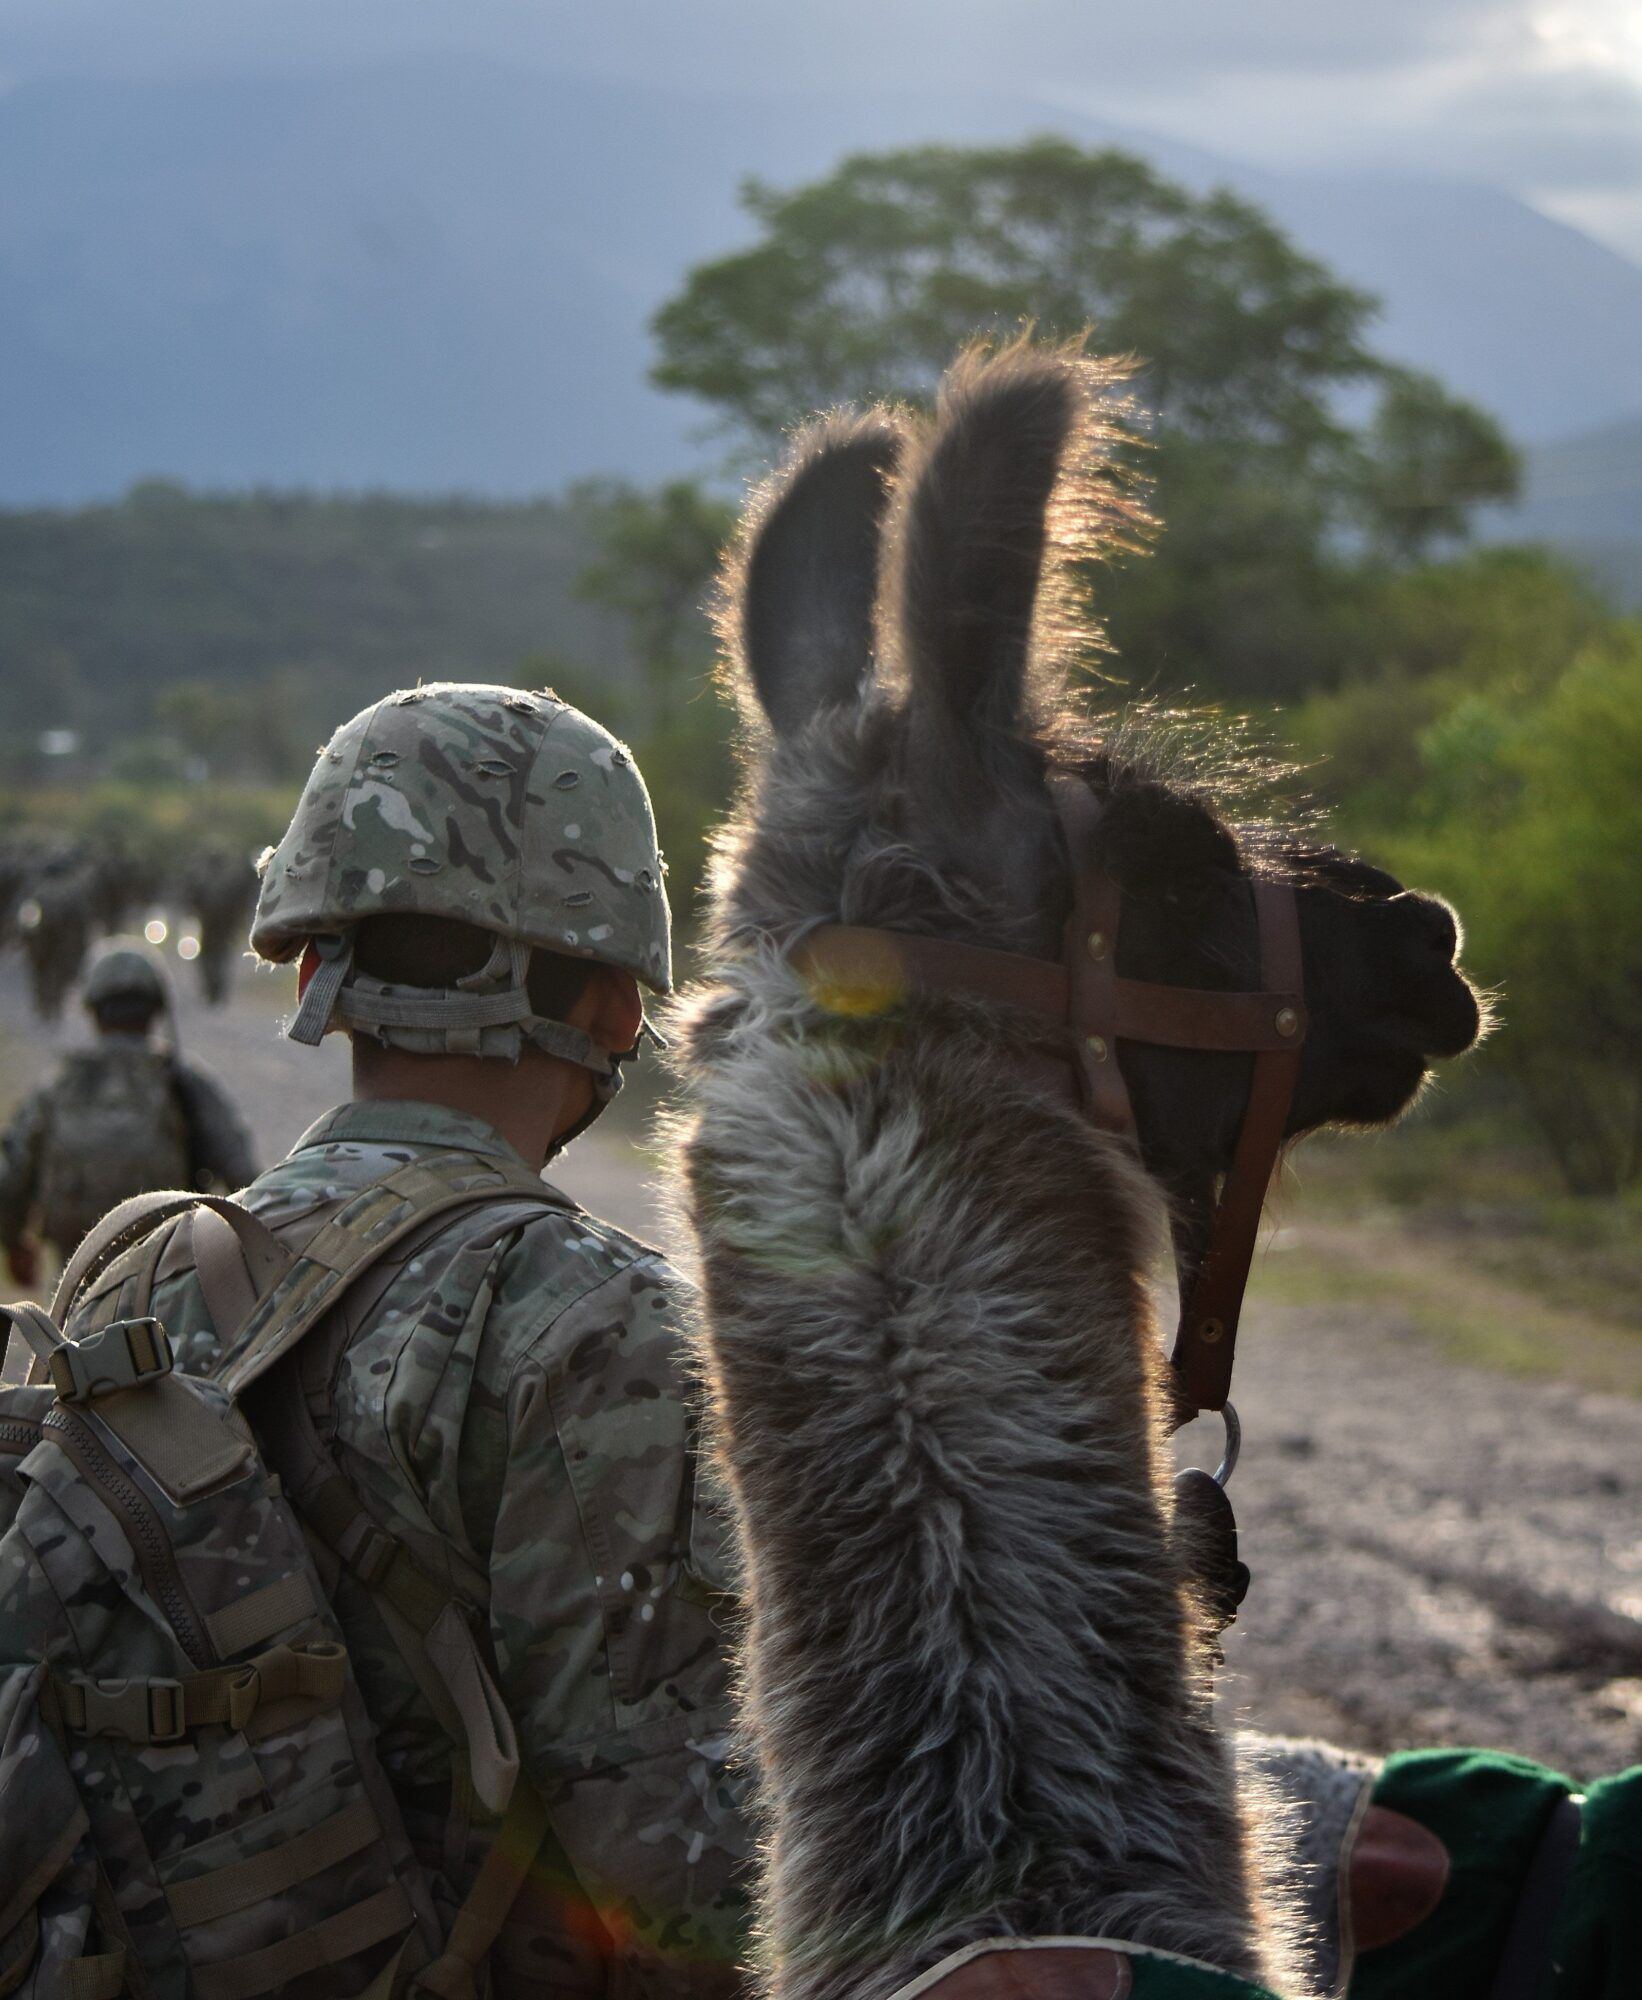 esercito argentino arruolamento lama montagna artiglieria